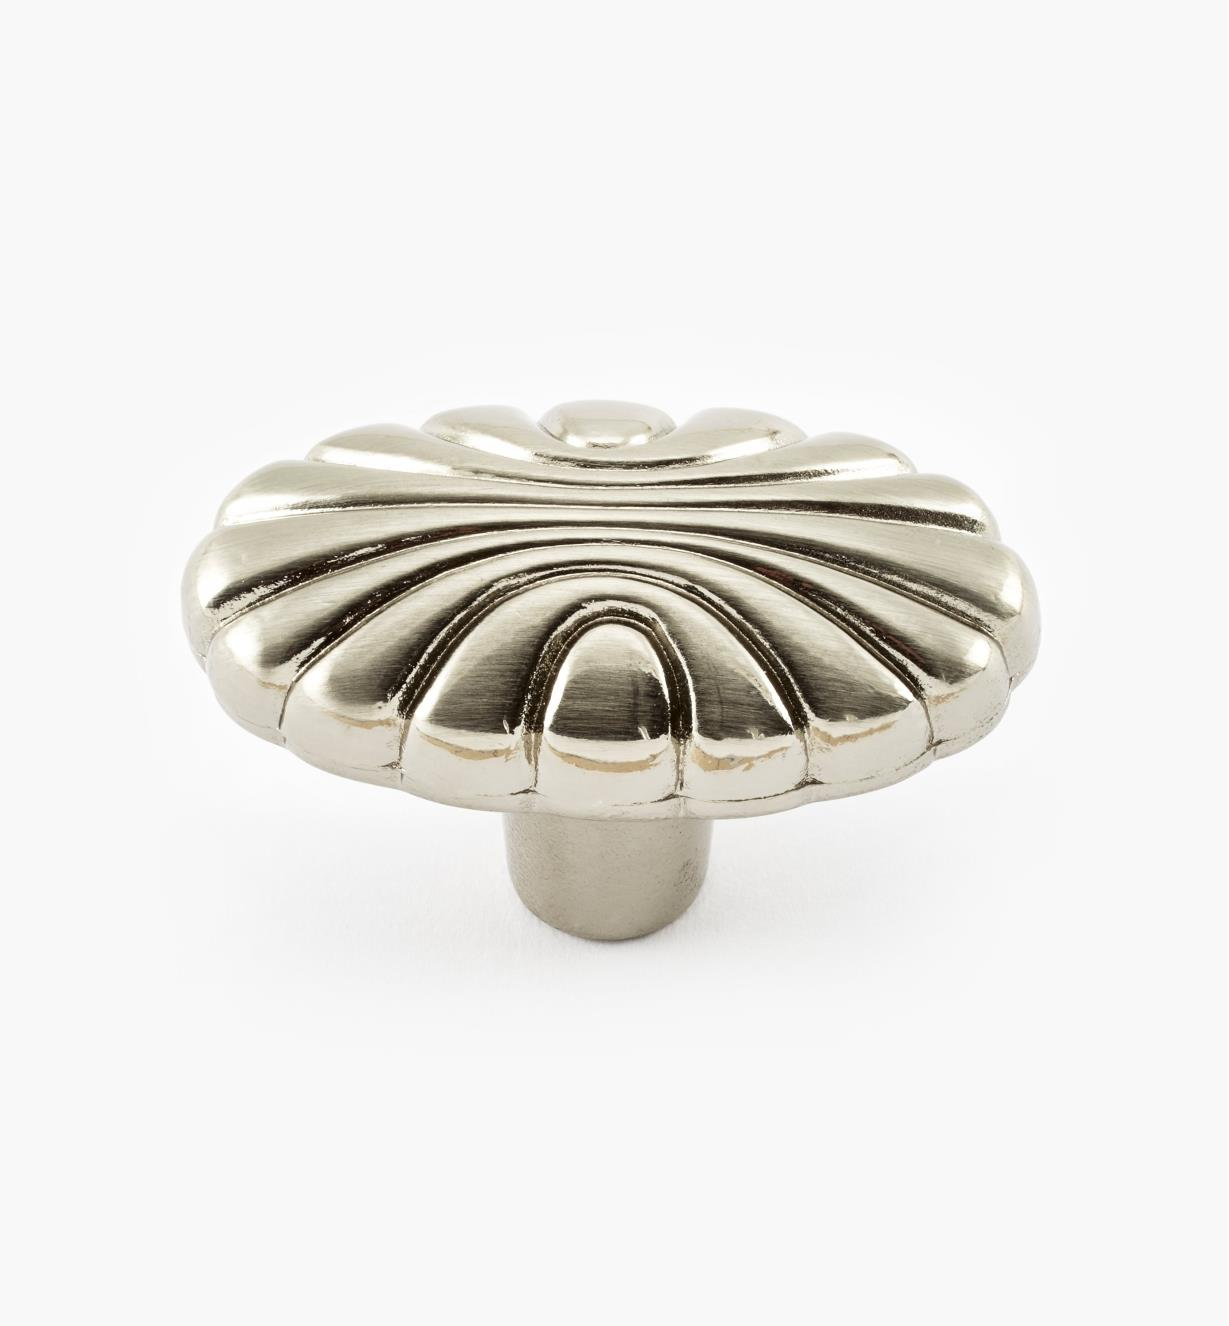 "02A2212 - Amerock Natural Elegance Satin Nickel 1 9/16"" x 1"" Oval Shell Knob, ea."